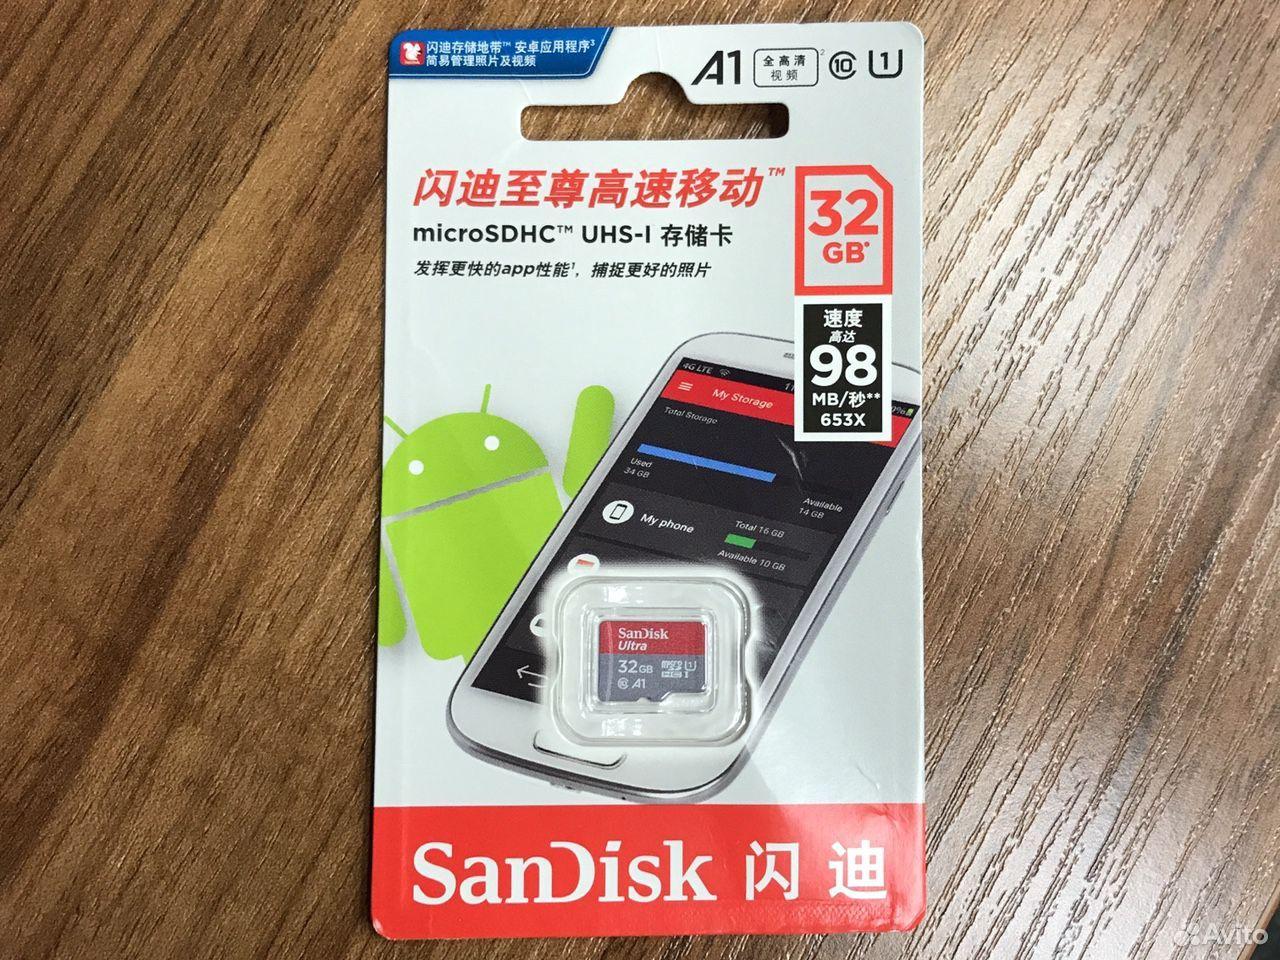 Карта памяти MicroSD на 32гига